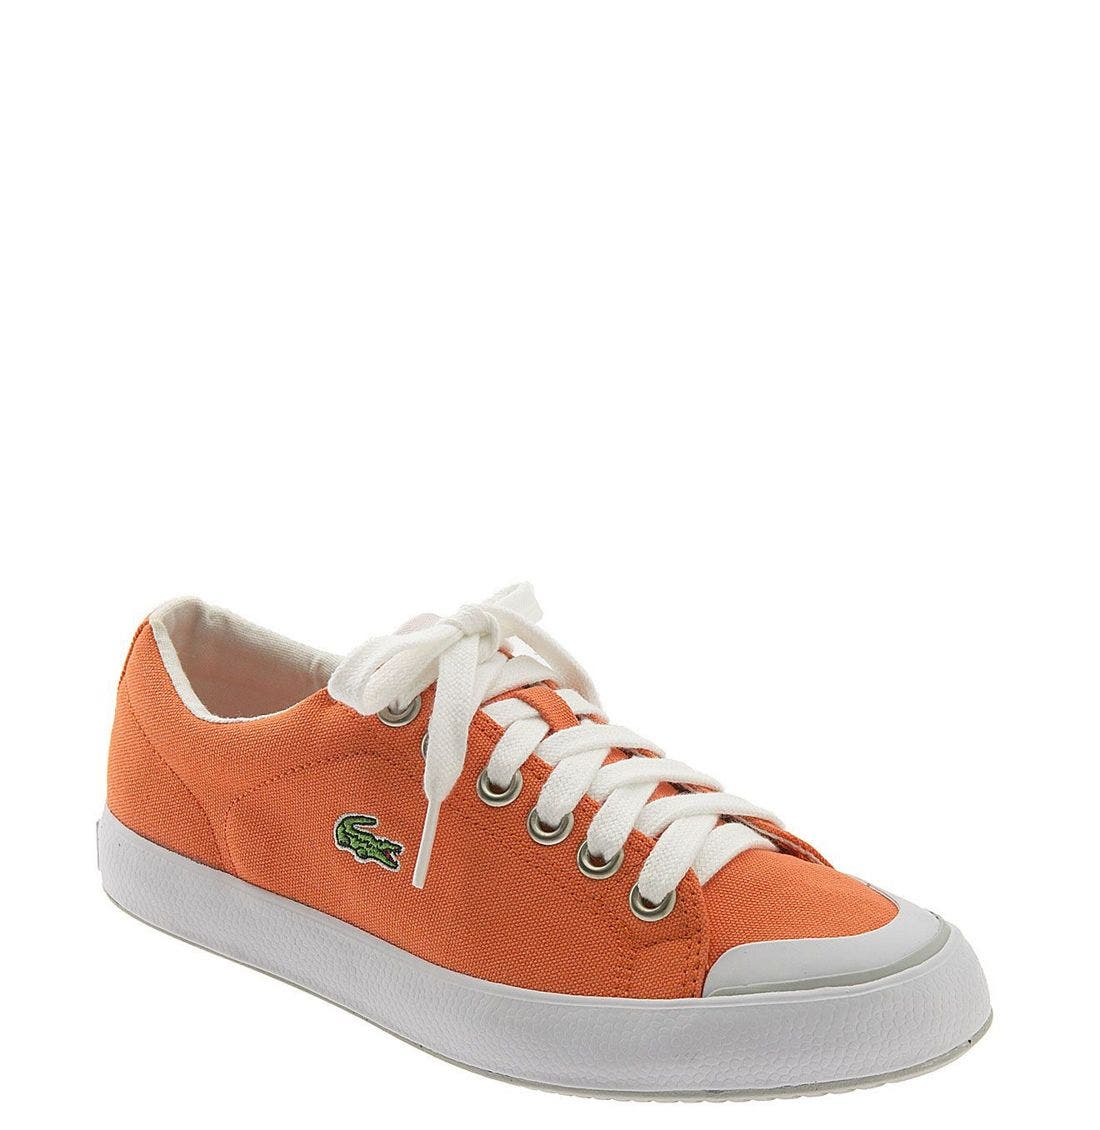 Alternate Image 1 Selected - Lacoste 'L33 Canvas' Sneaker (Women)